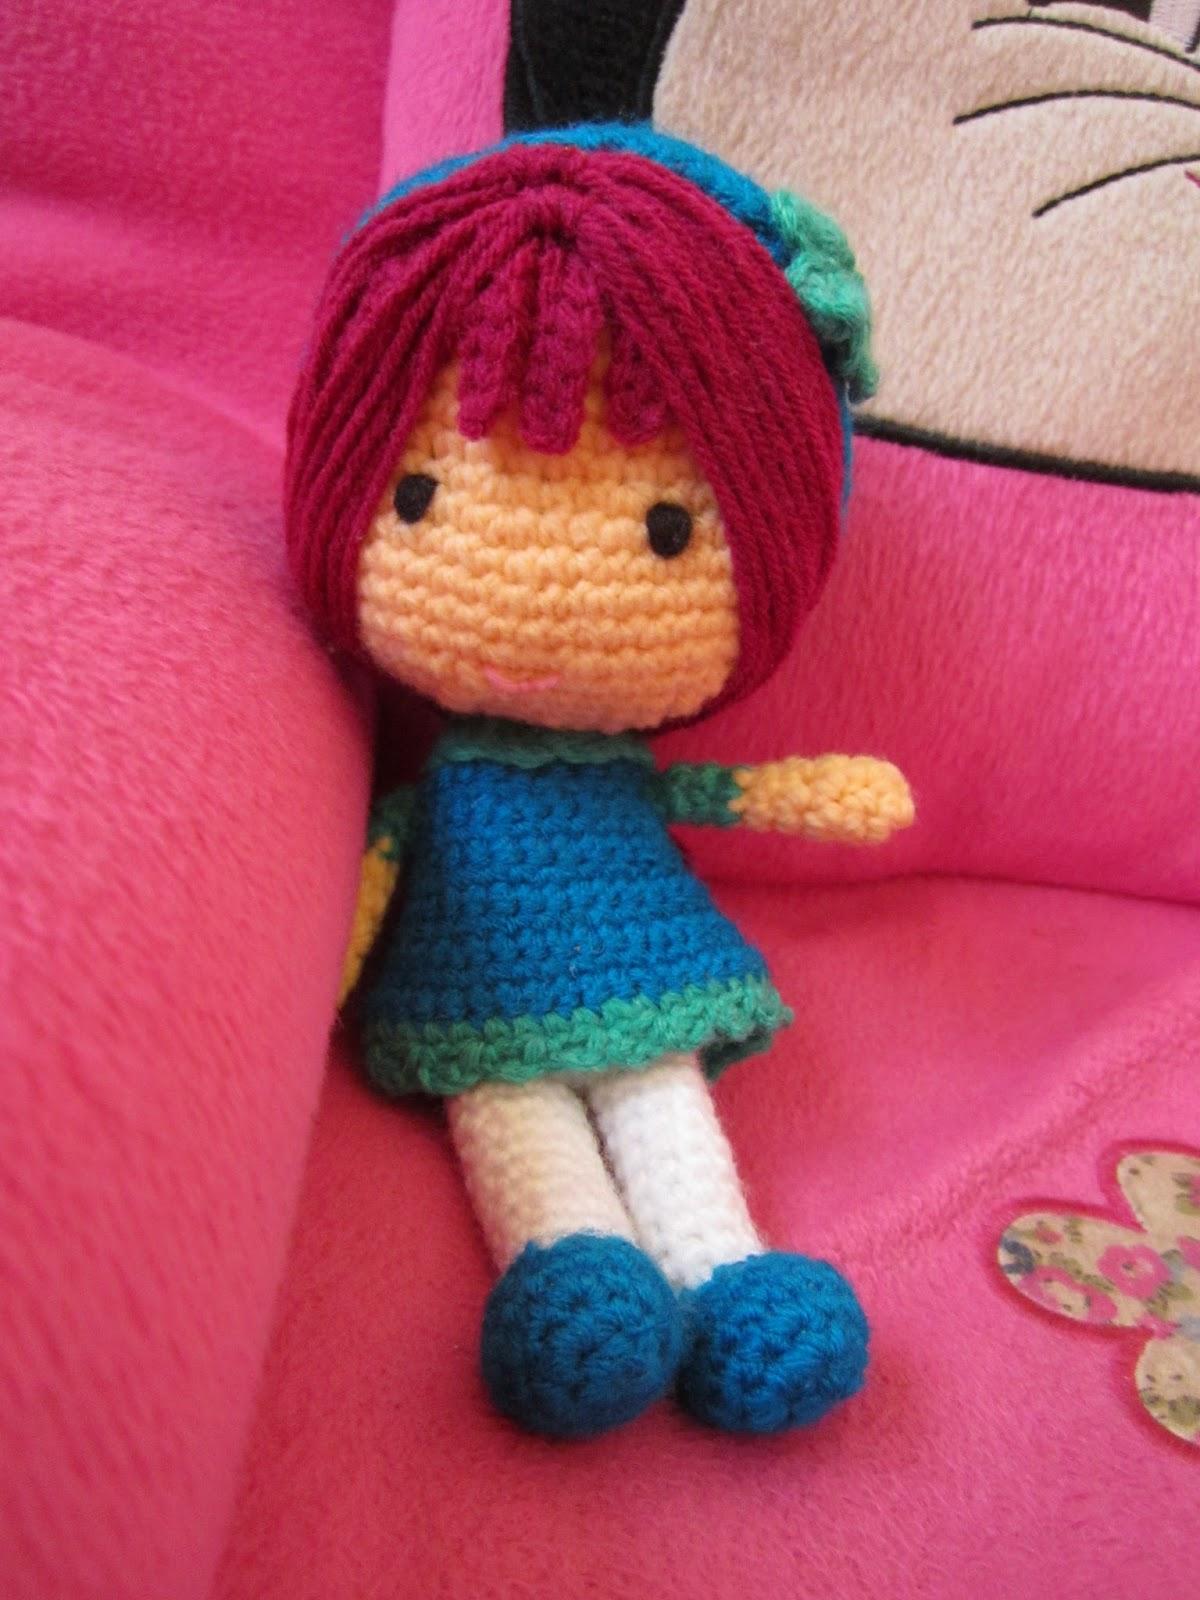 Amigurumi Hair Patterns : A little love everyday!: Amigurumi doll..